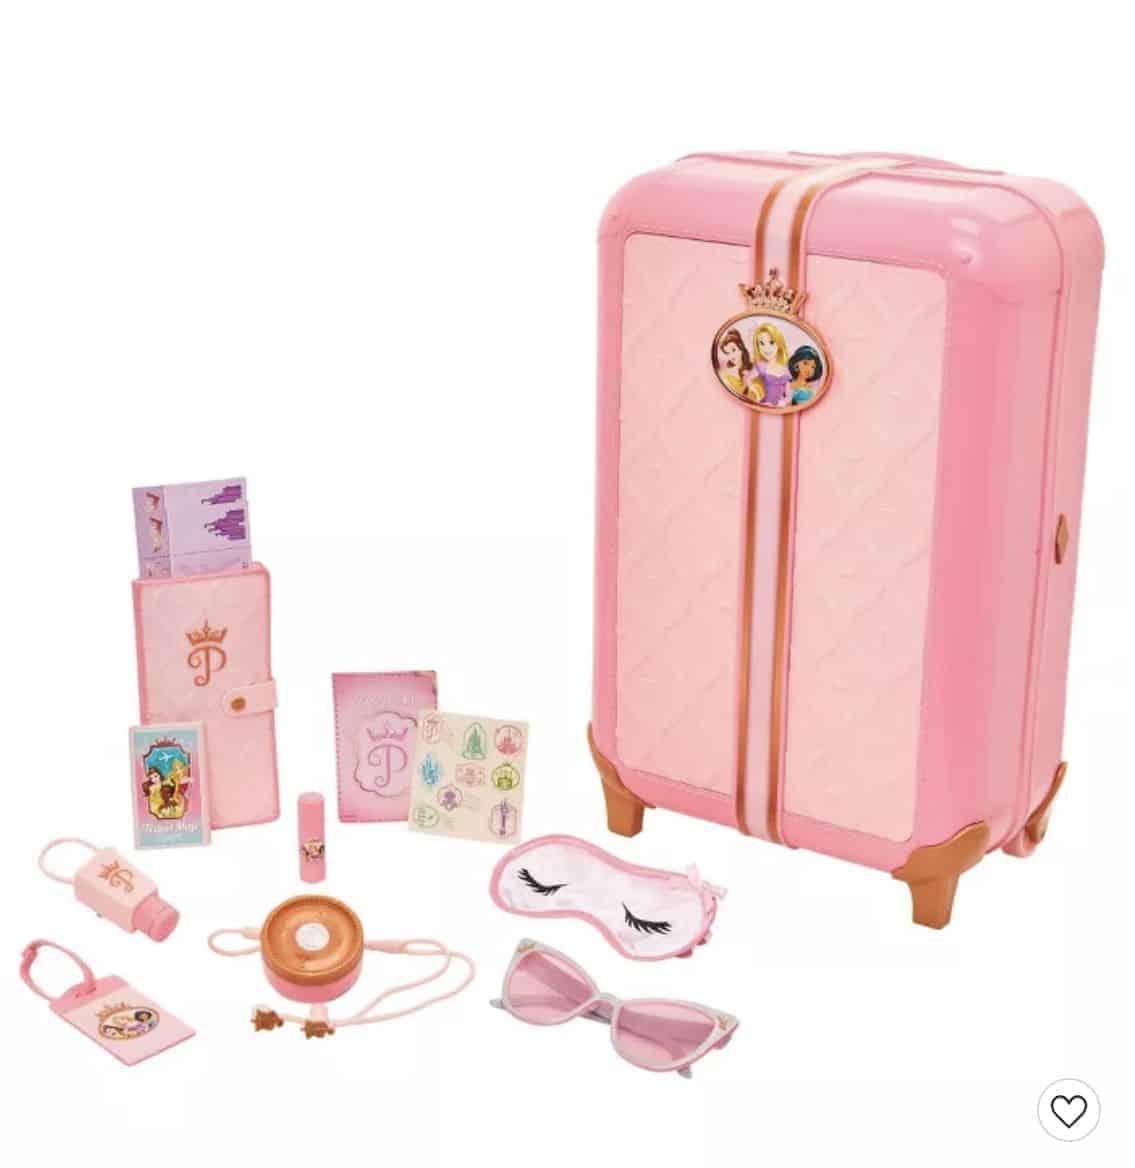 disney-princess-play-suitcase-set